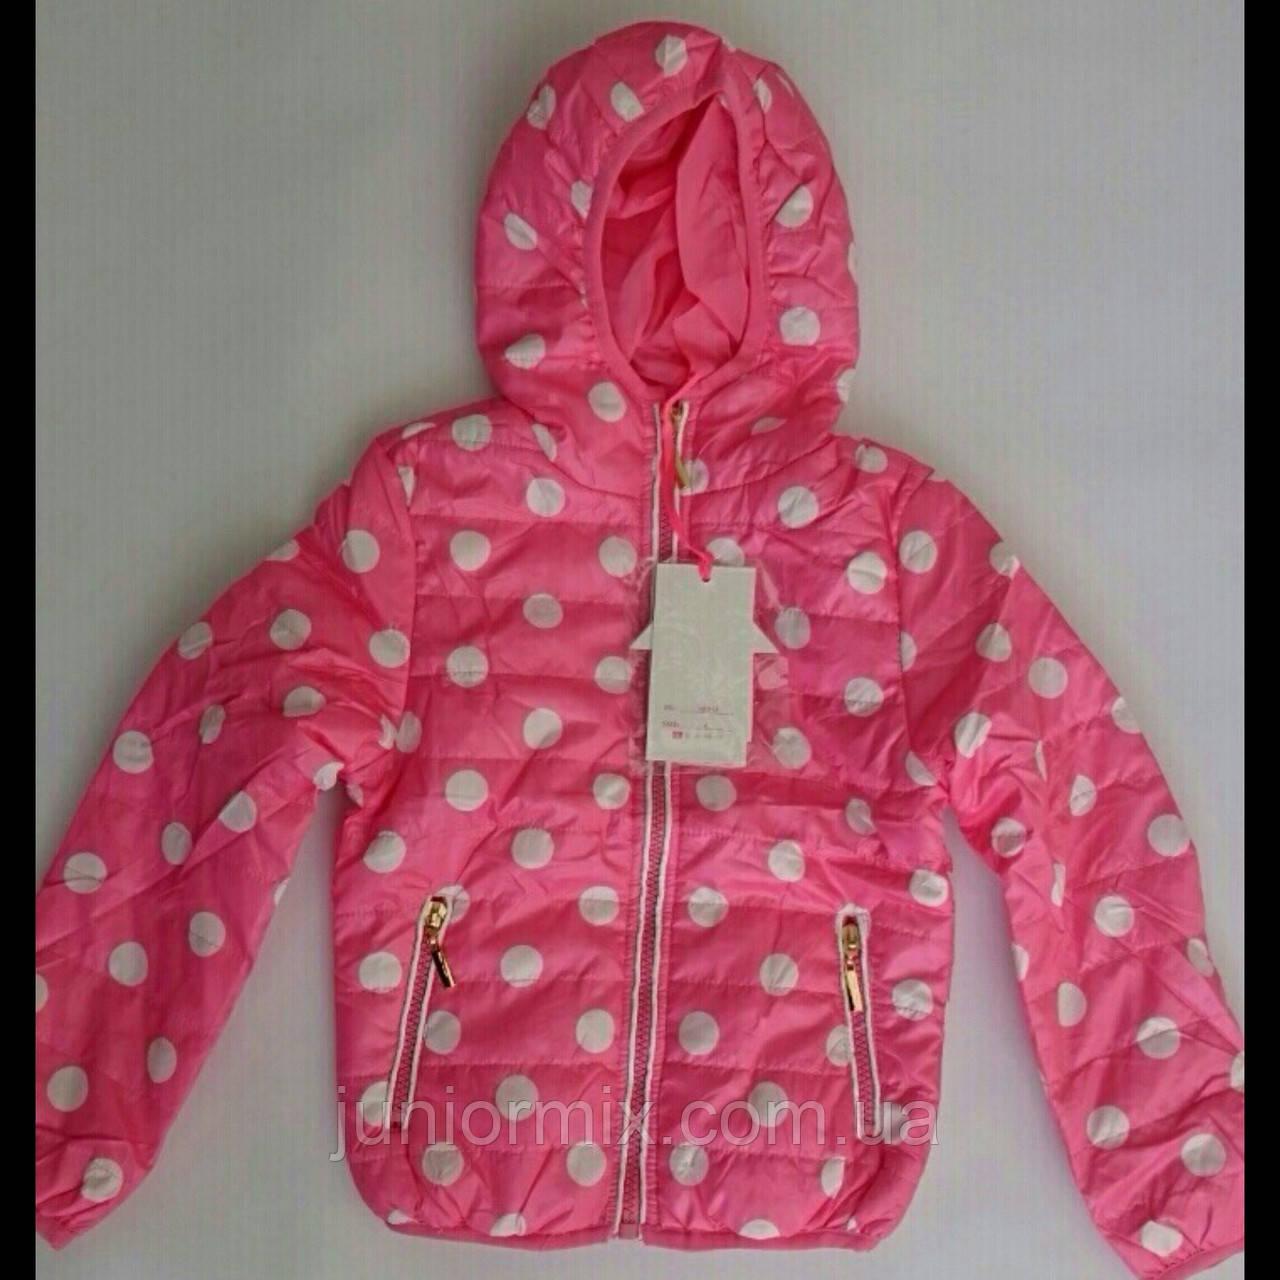 Весенняя куртка на девочку HAAPPY HOVSE